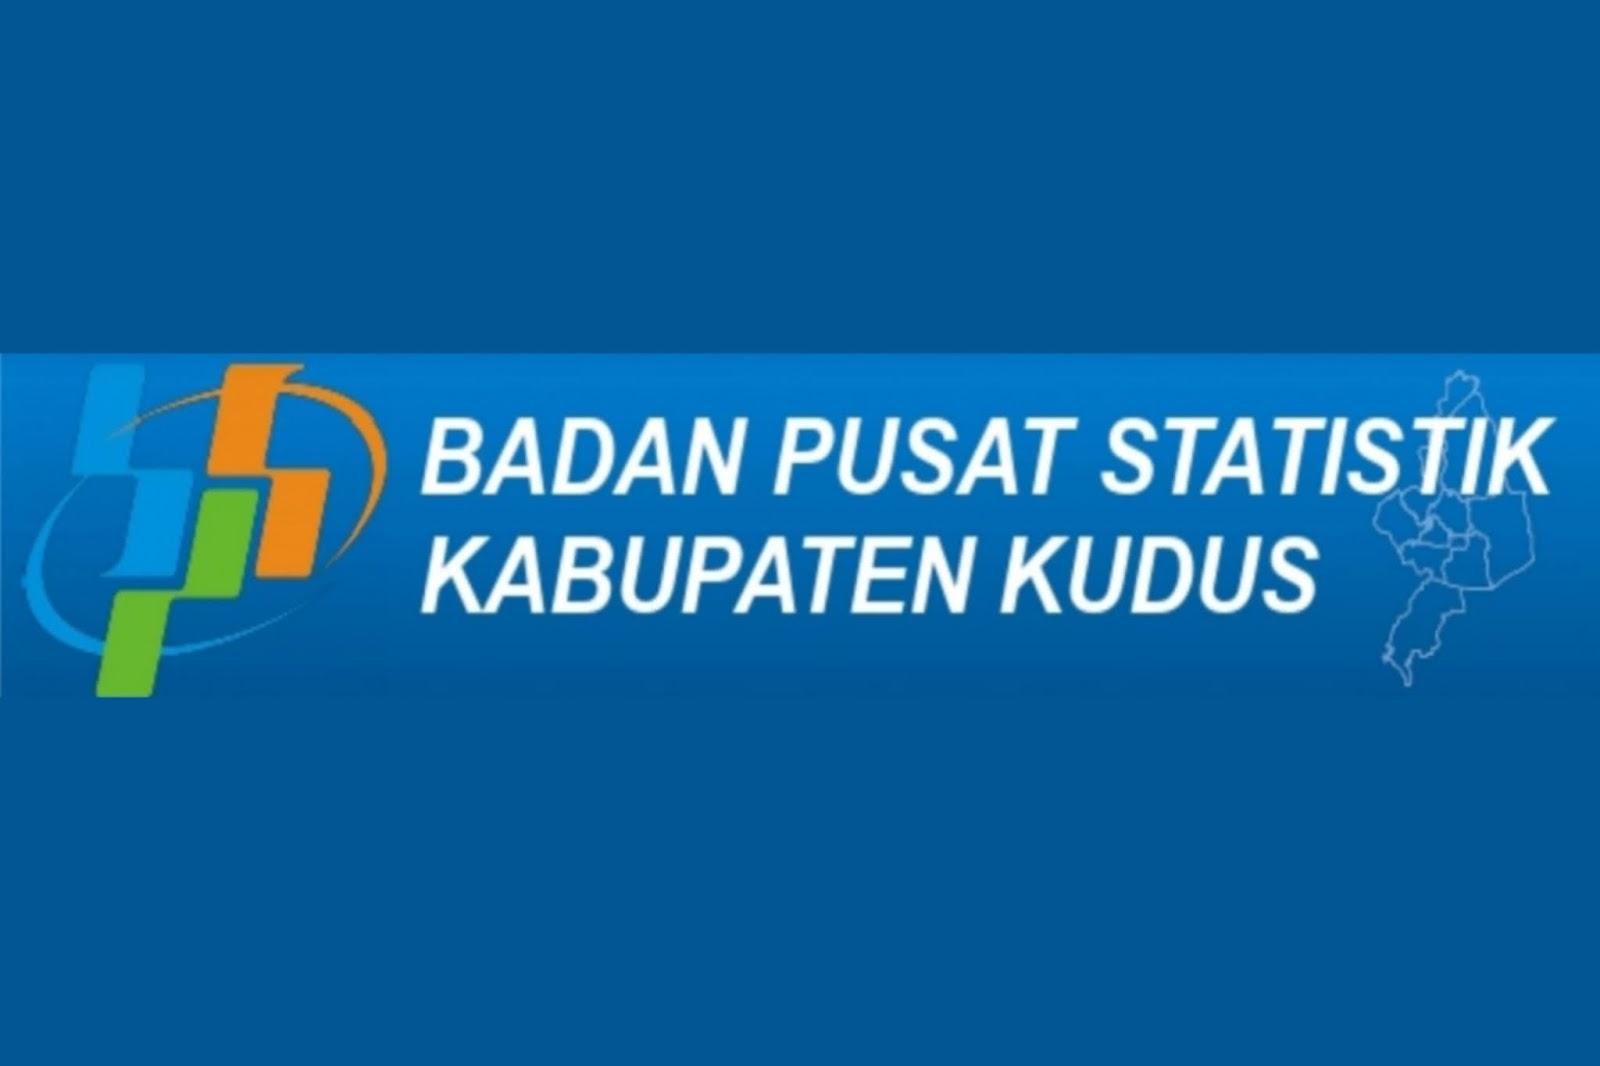 Lowongan Kudus di Badan Pusat Statistik  Kabupaten Kudus  Membuka Rekrutmen Petugas Sensus Penduduk September 2020 dengan syarat